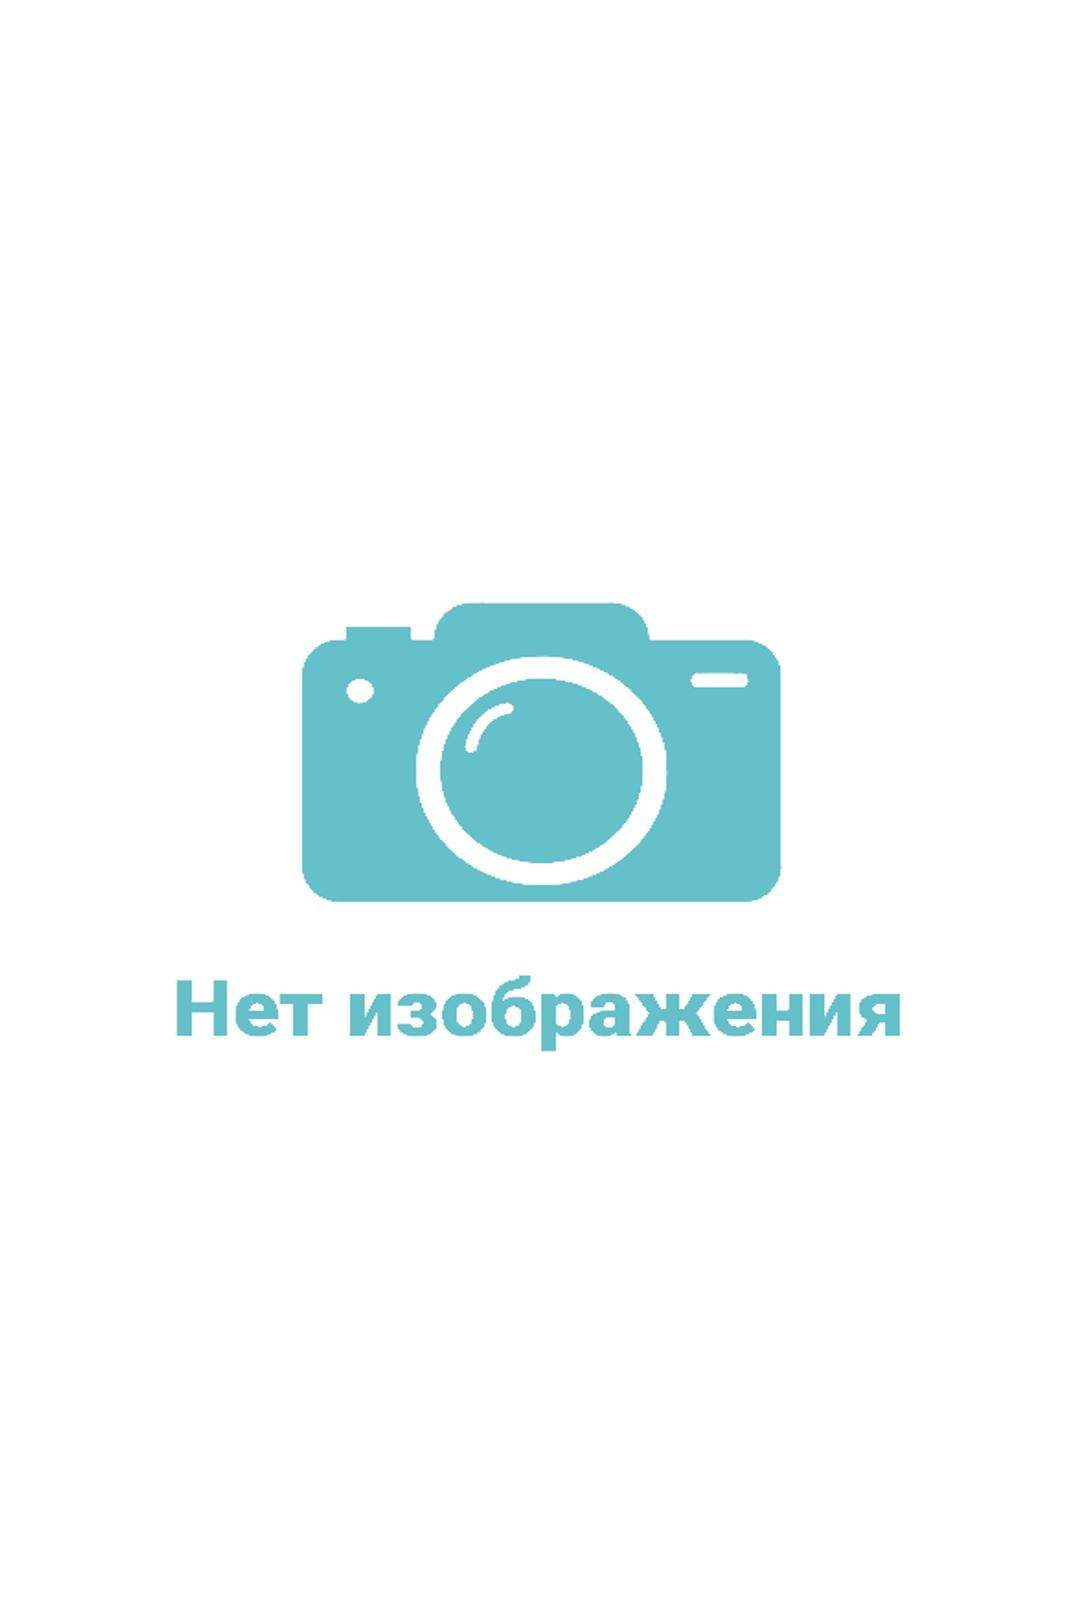 Травматолог-ортопед Воробьев Александр Анатольевич